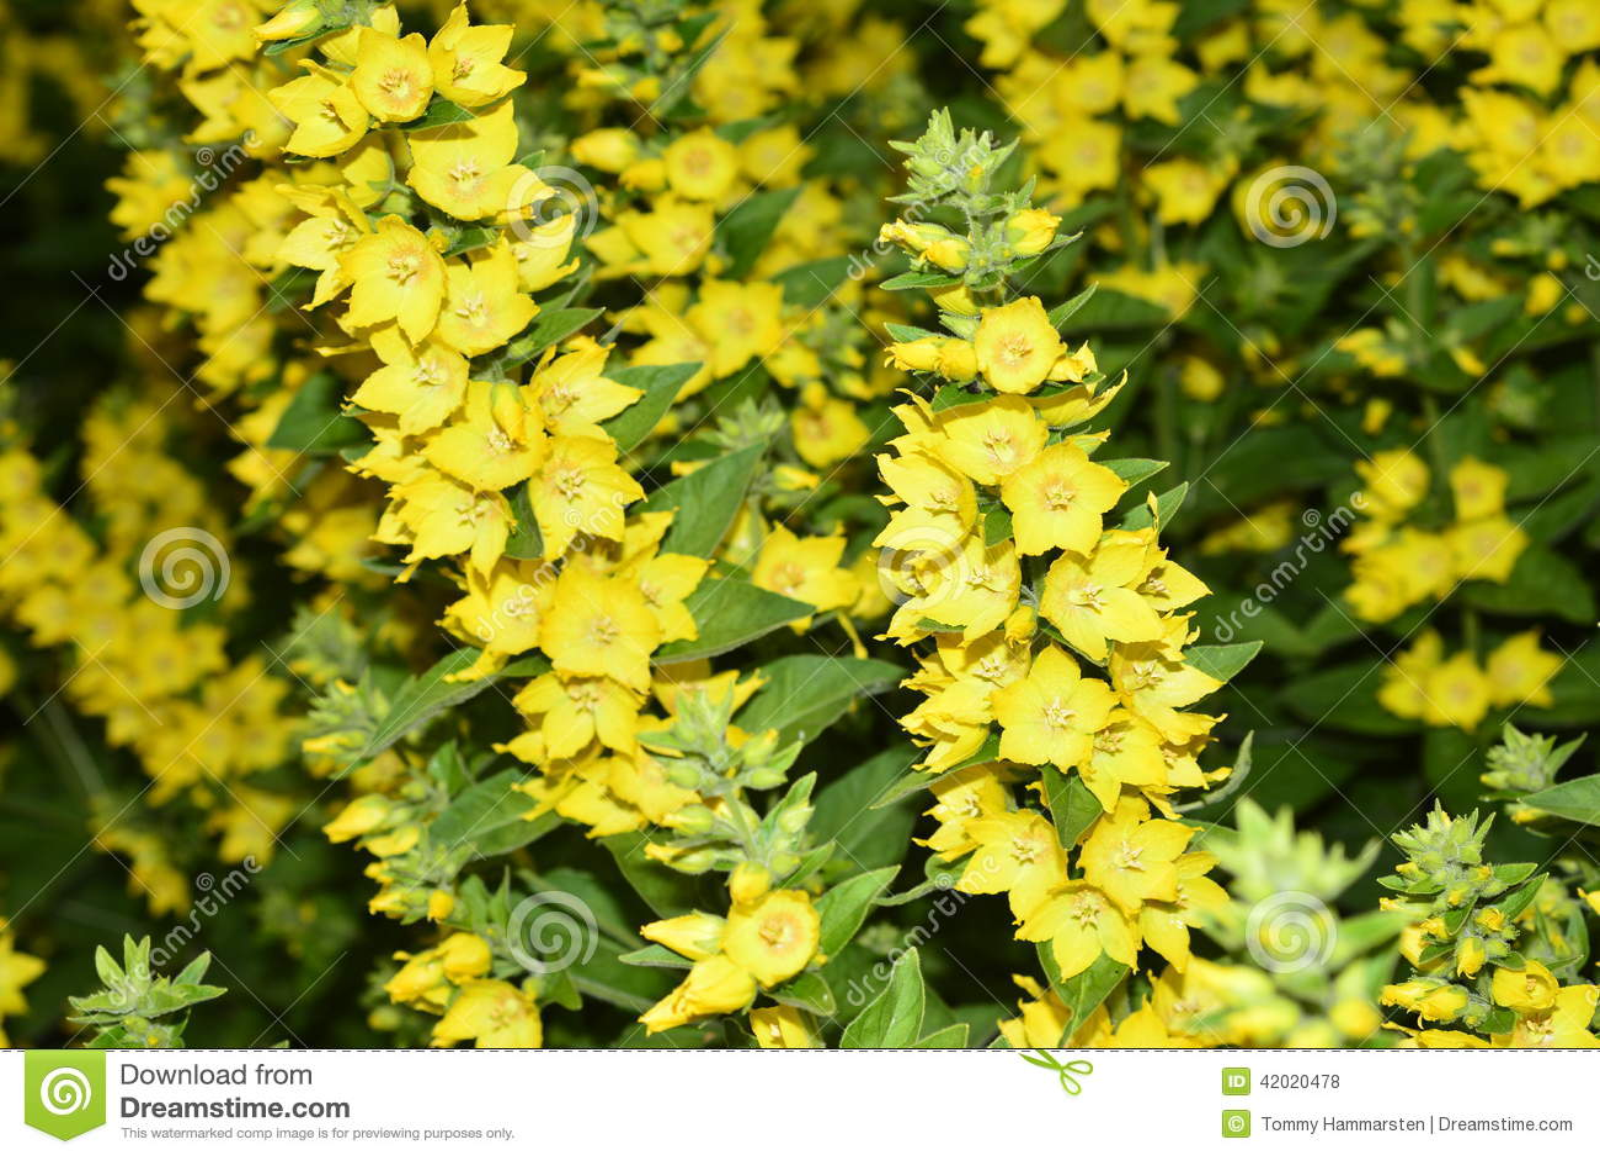 Yellow Garden Flowers Stock Photo Image 42020478